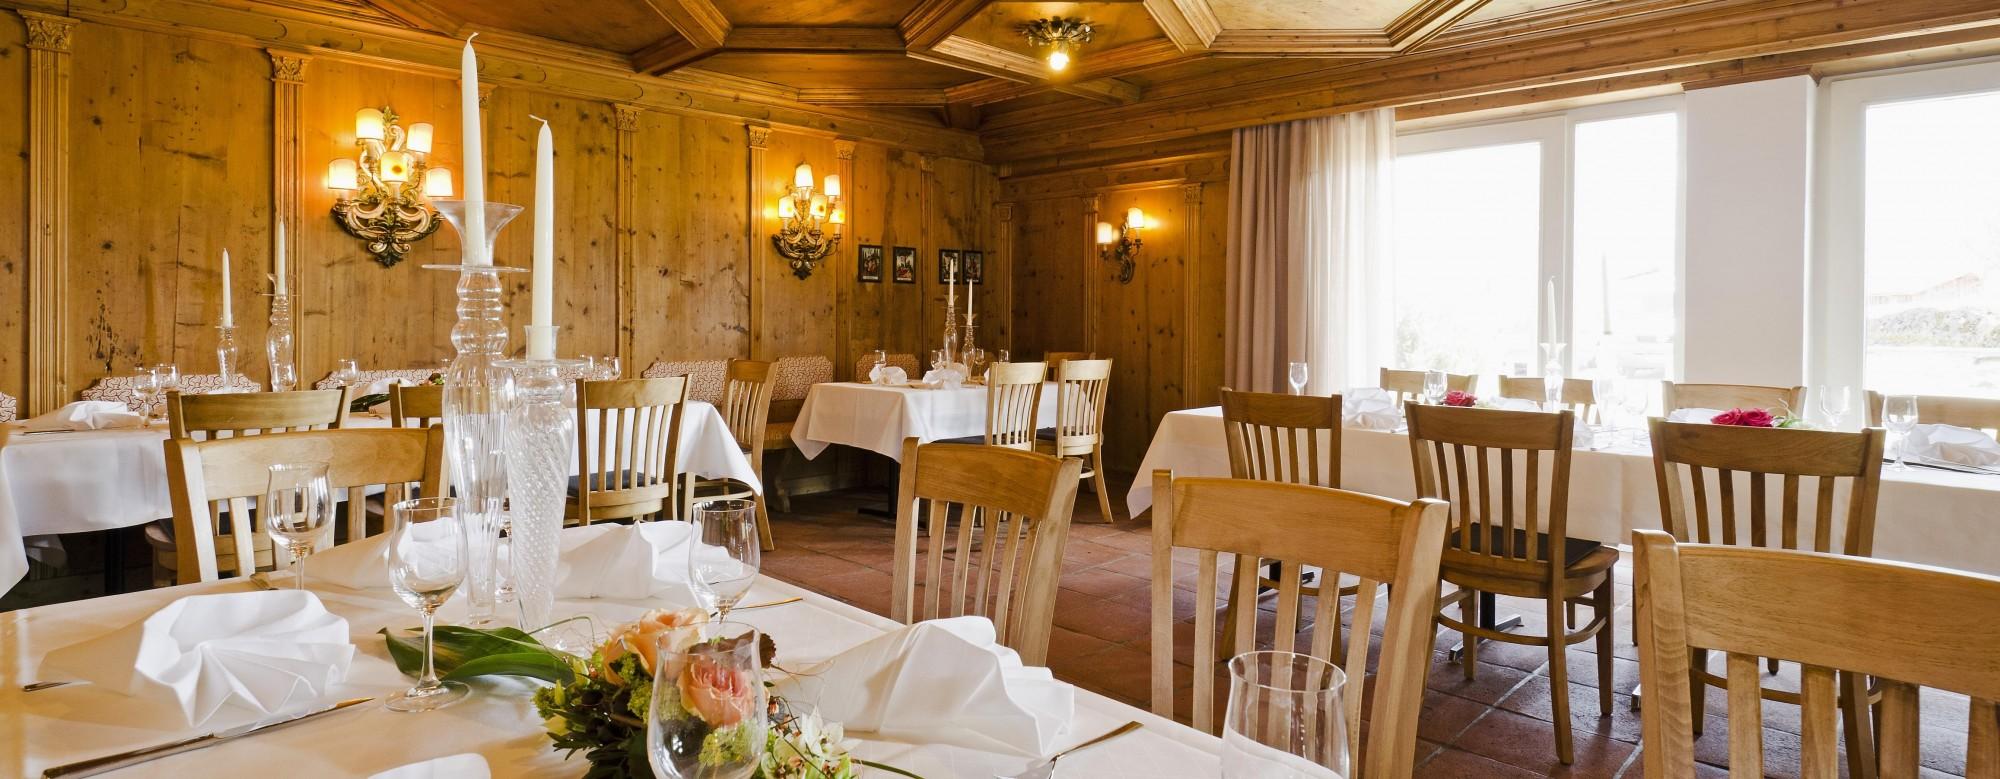 Kaufmann Restaurant